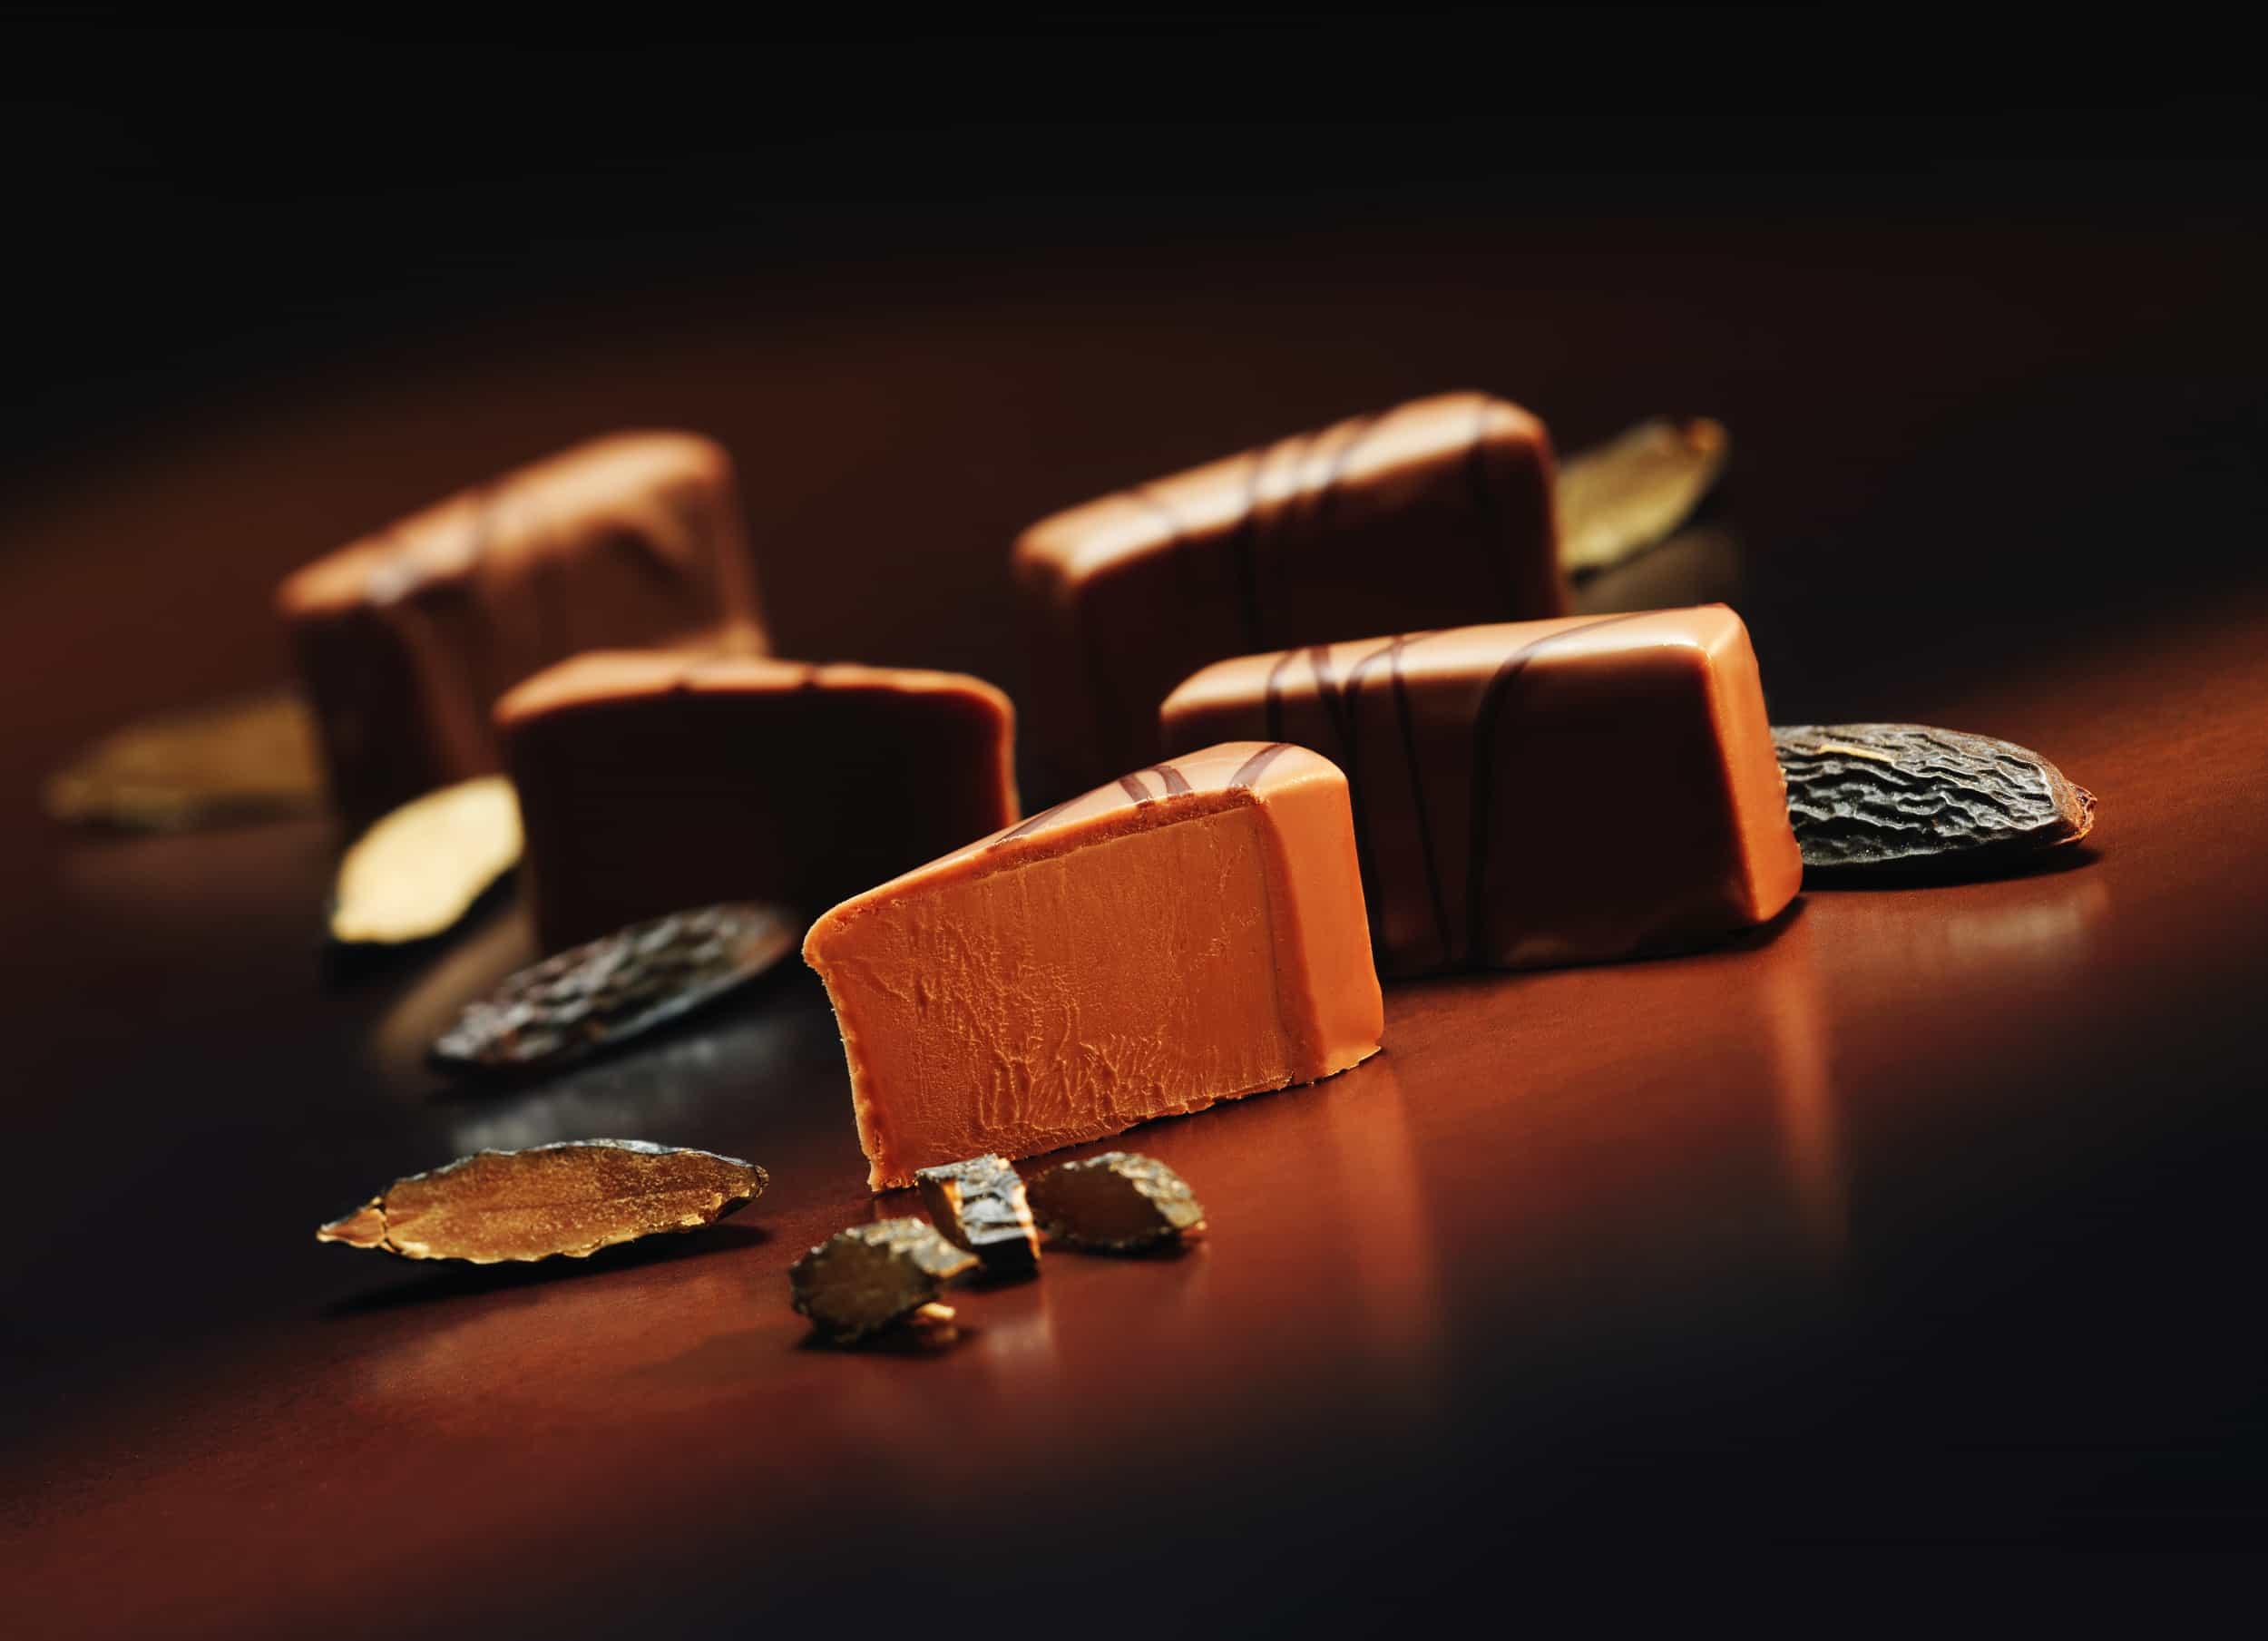 Imagination chocolates